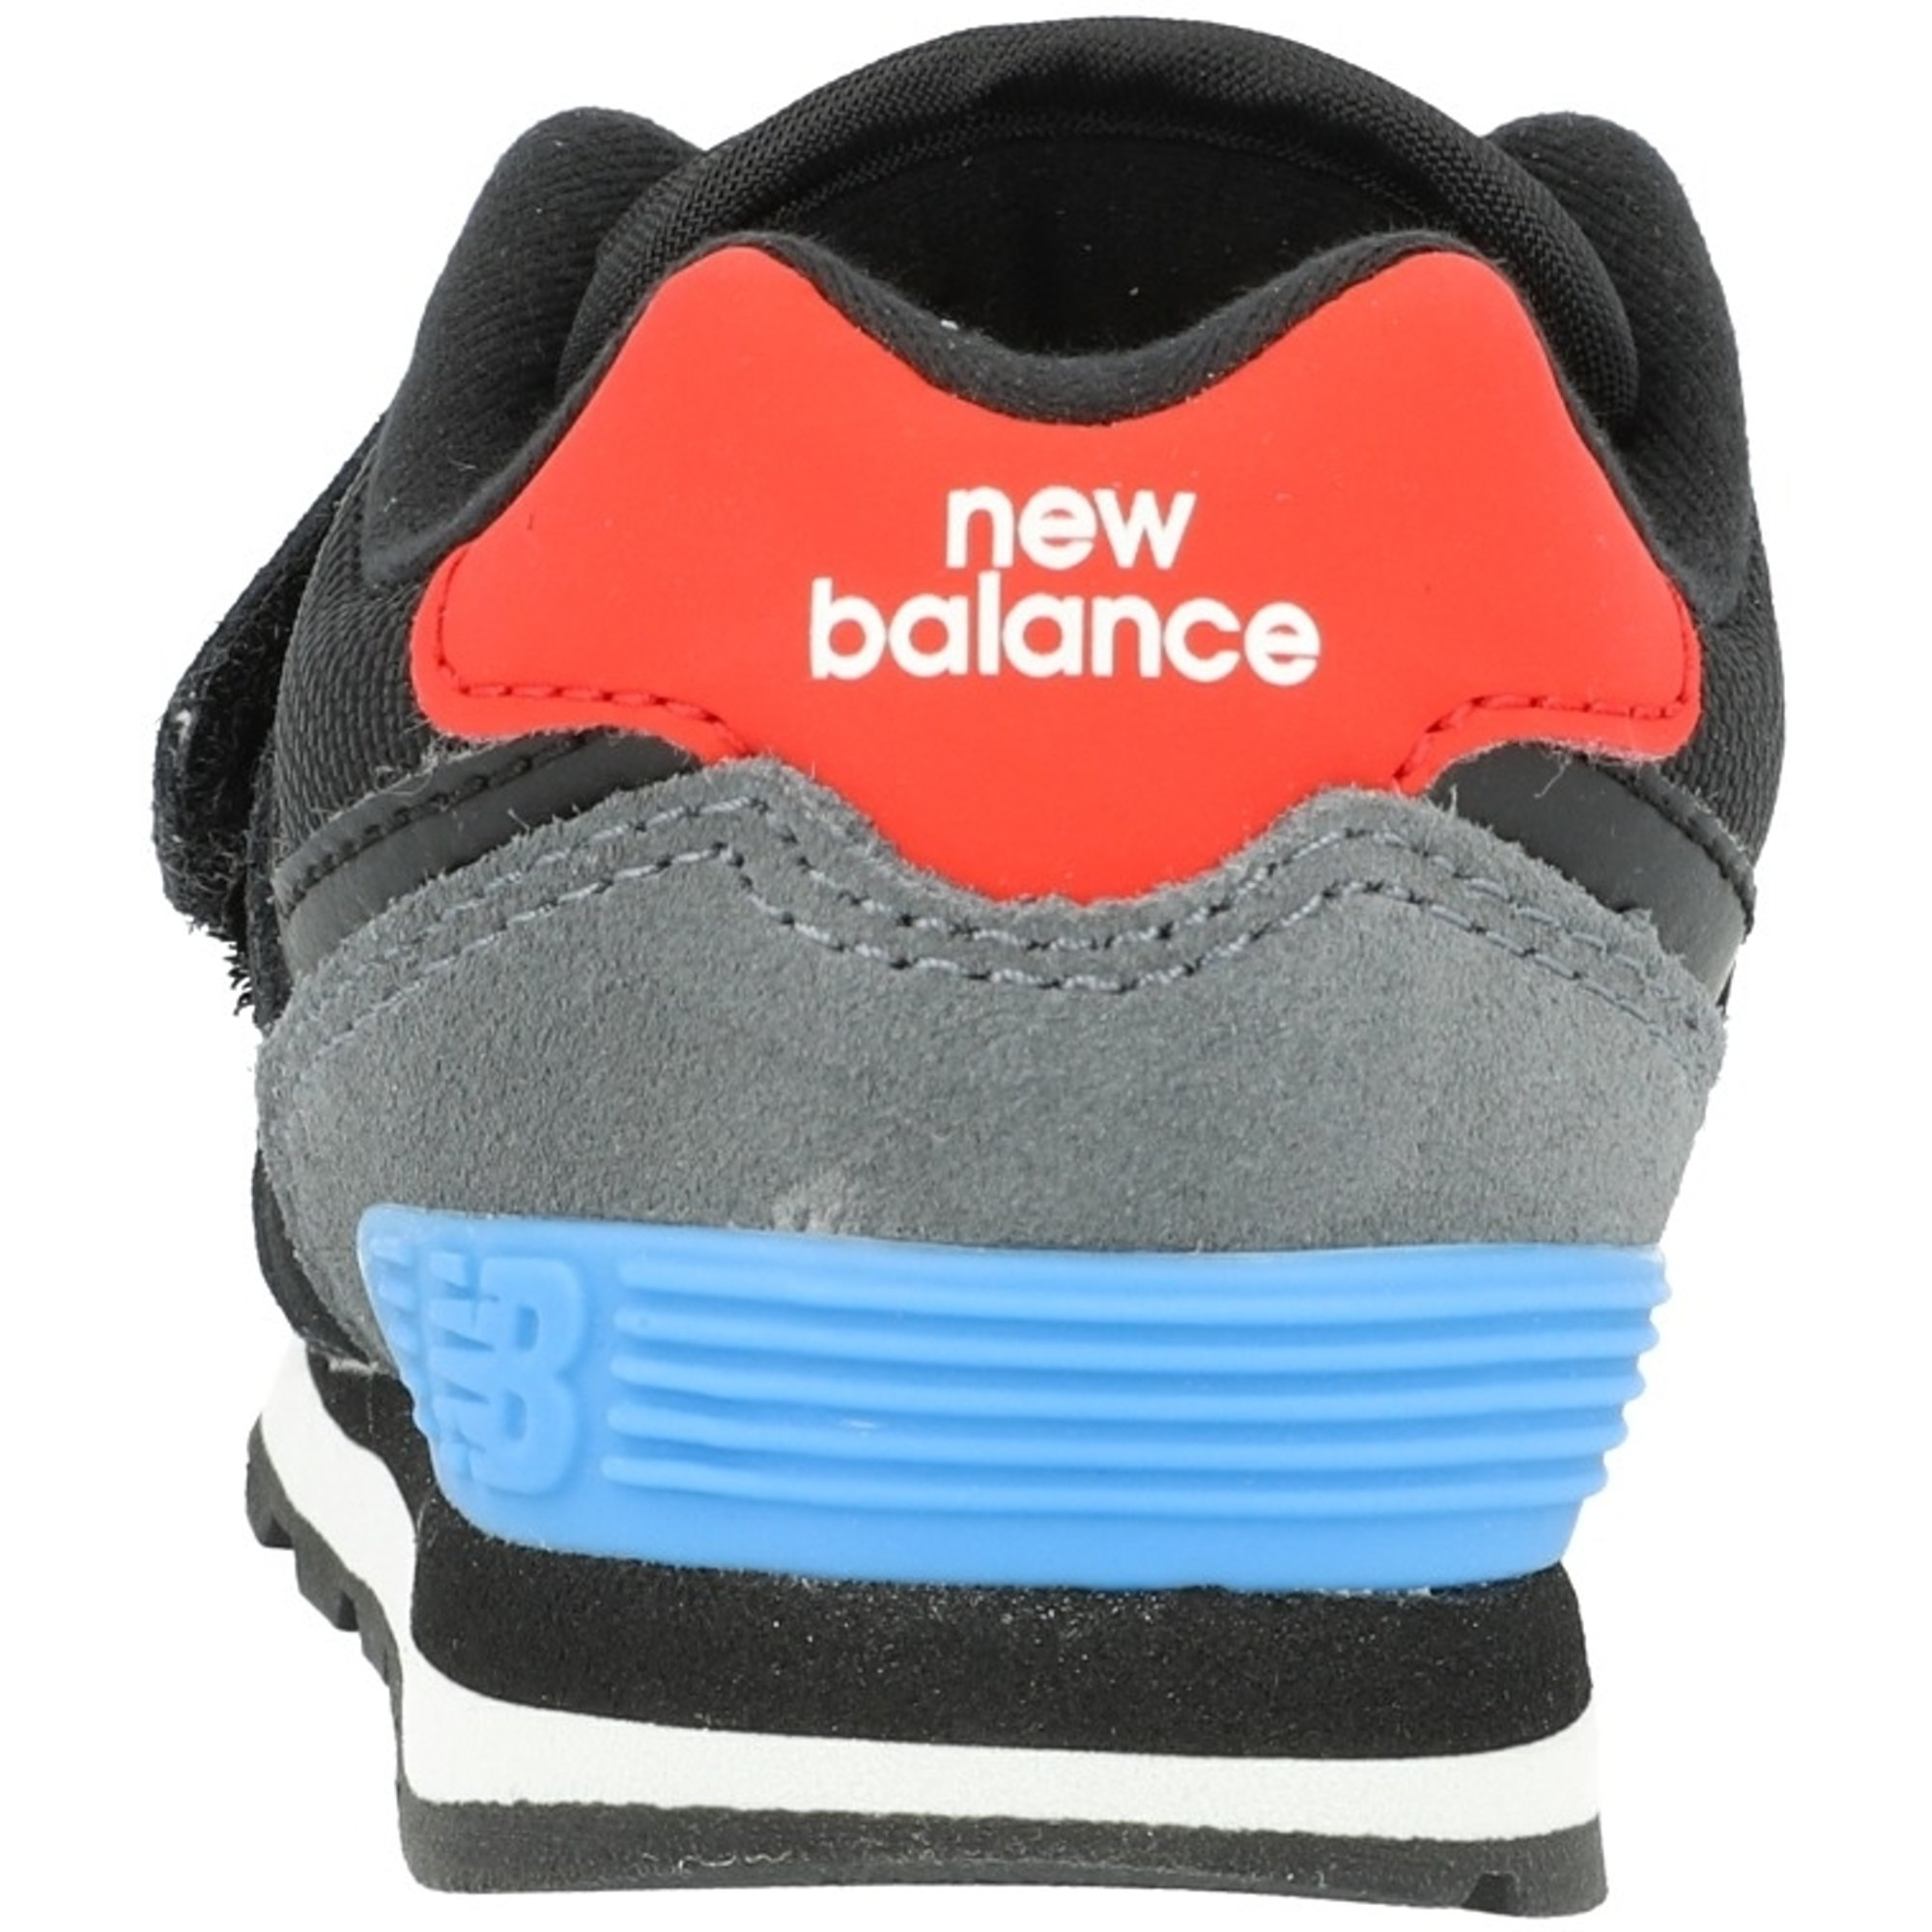 new balance 574 niño velcro